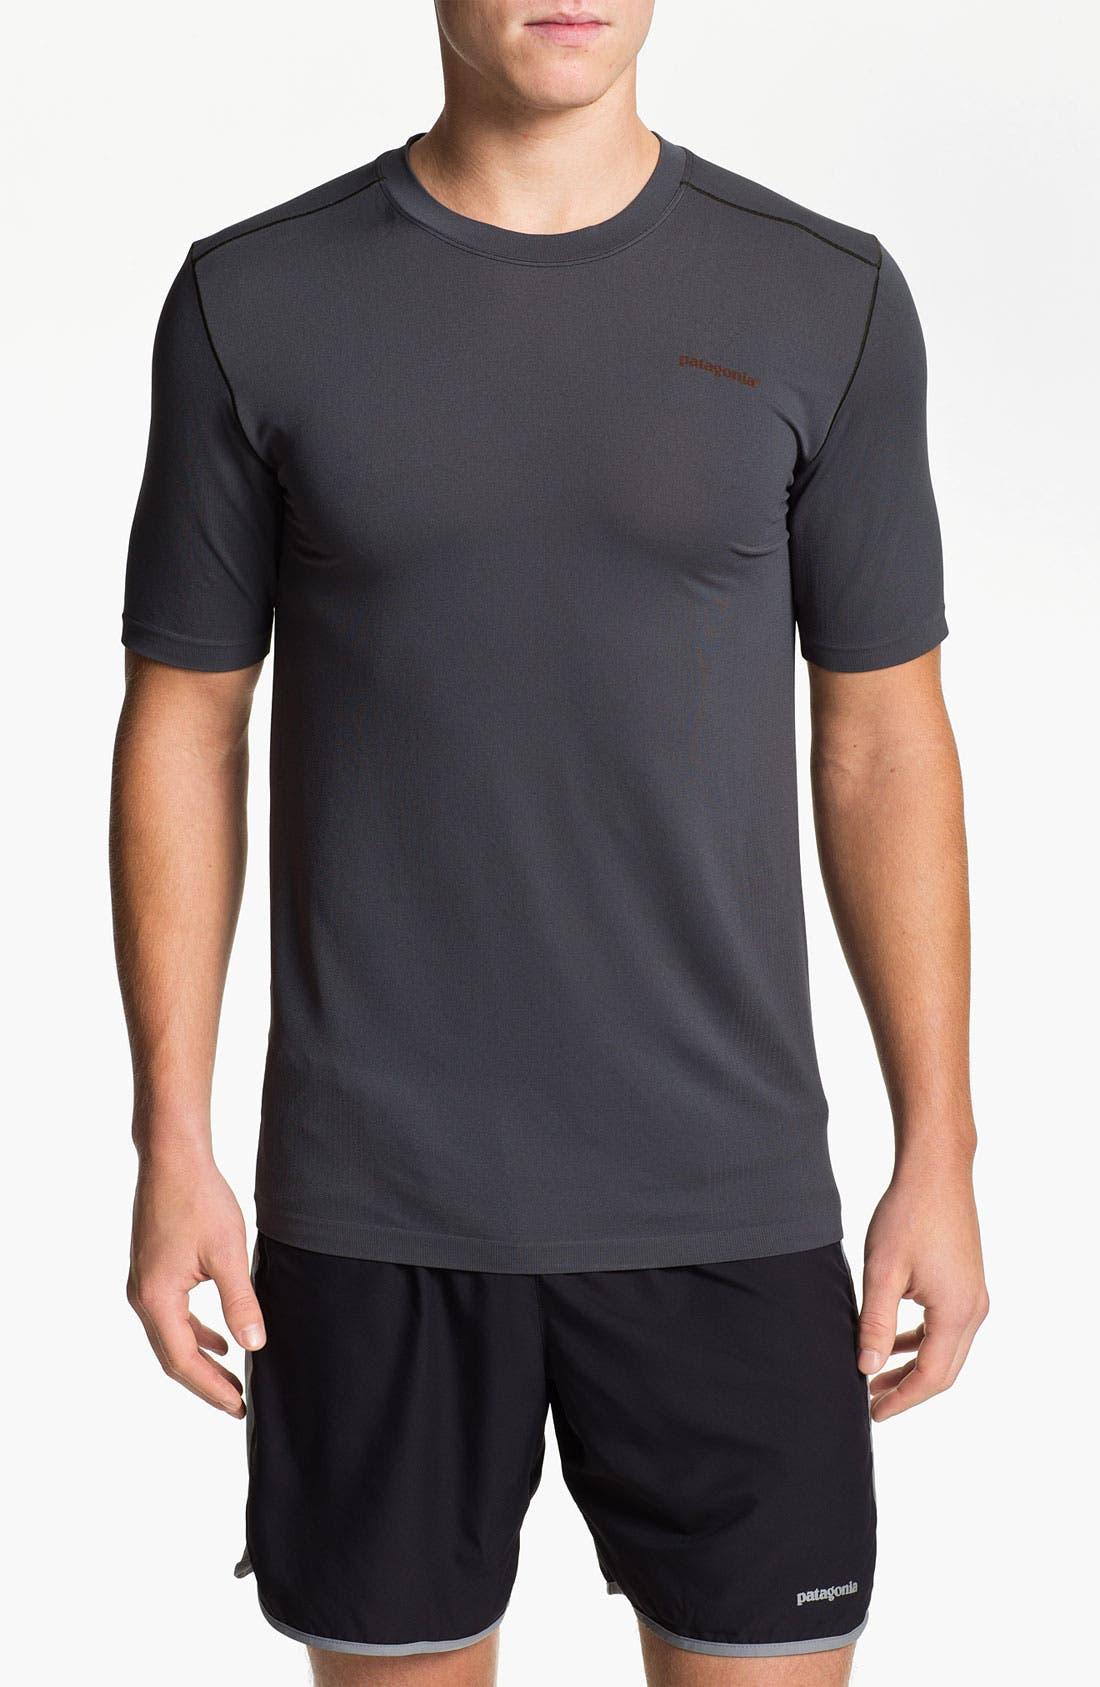 Main Image - Patagonia 'Gamut' T-Shirt